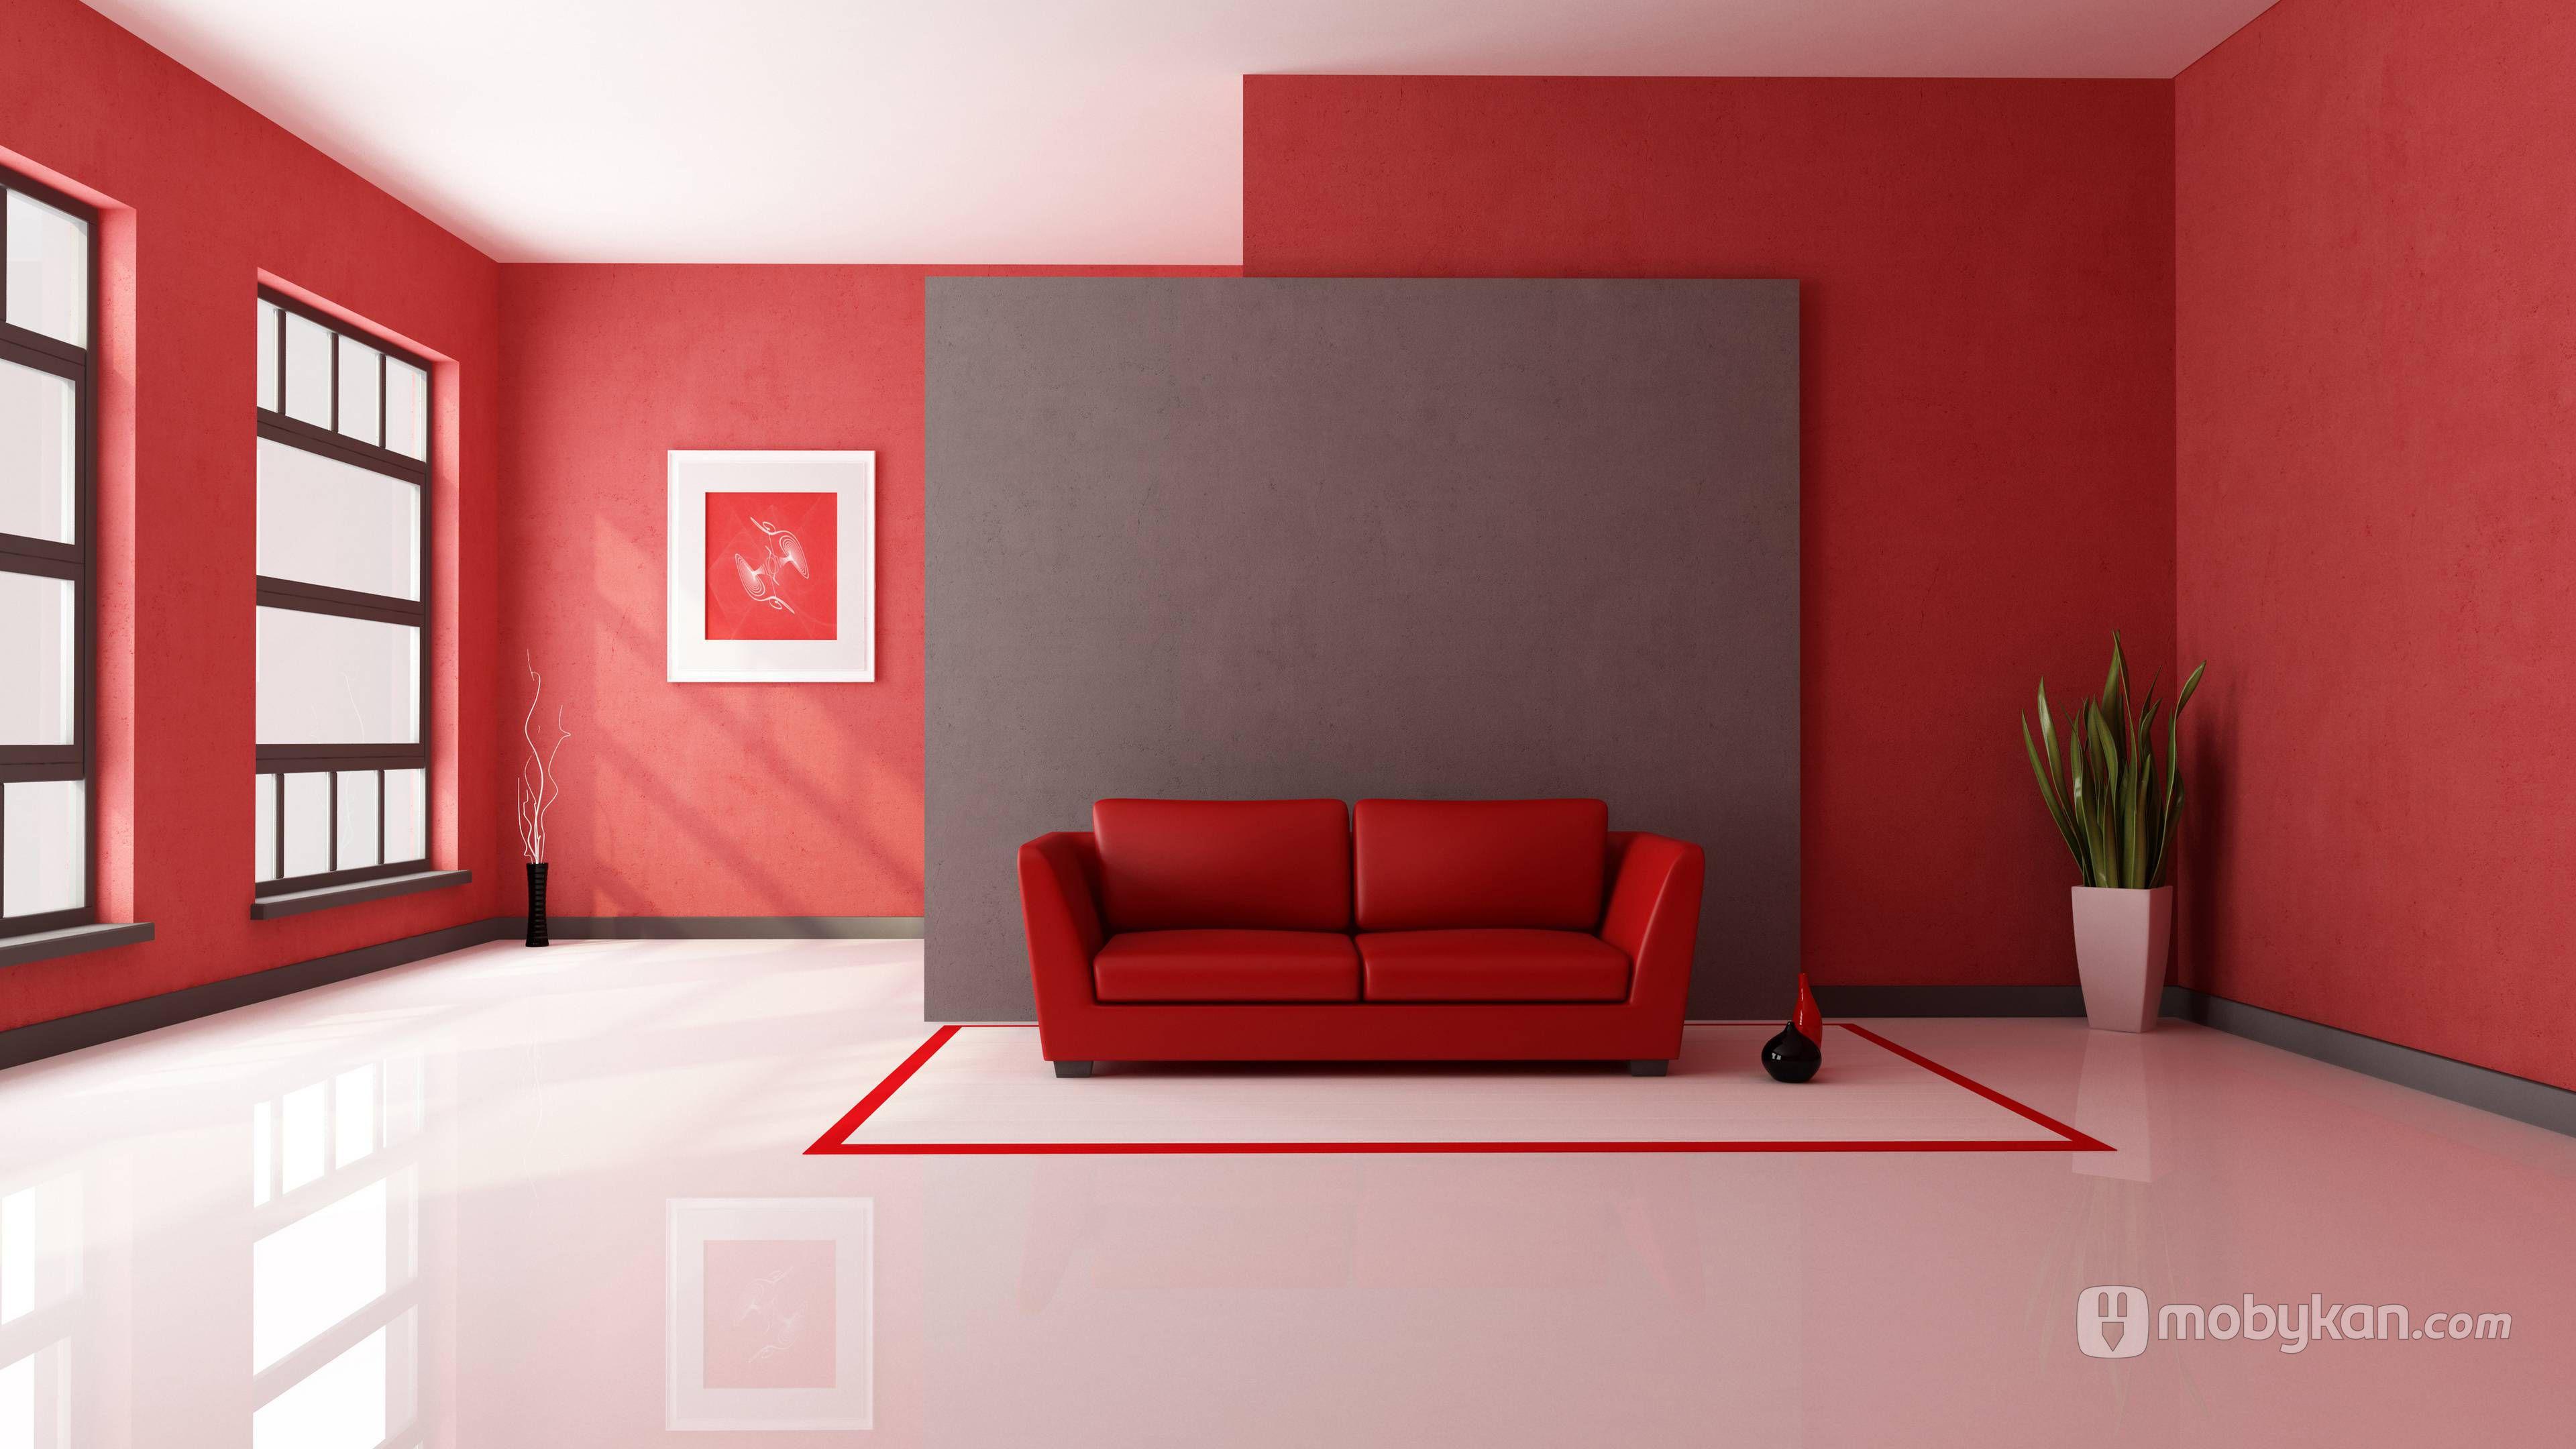 الوان دهانات مميزه افكار ل الوان الدهان مجلة موبيكان Living Room Wall Color Room Wall Colors Living Room Color Schemes